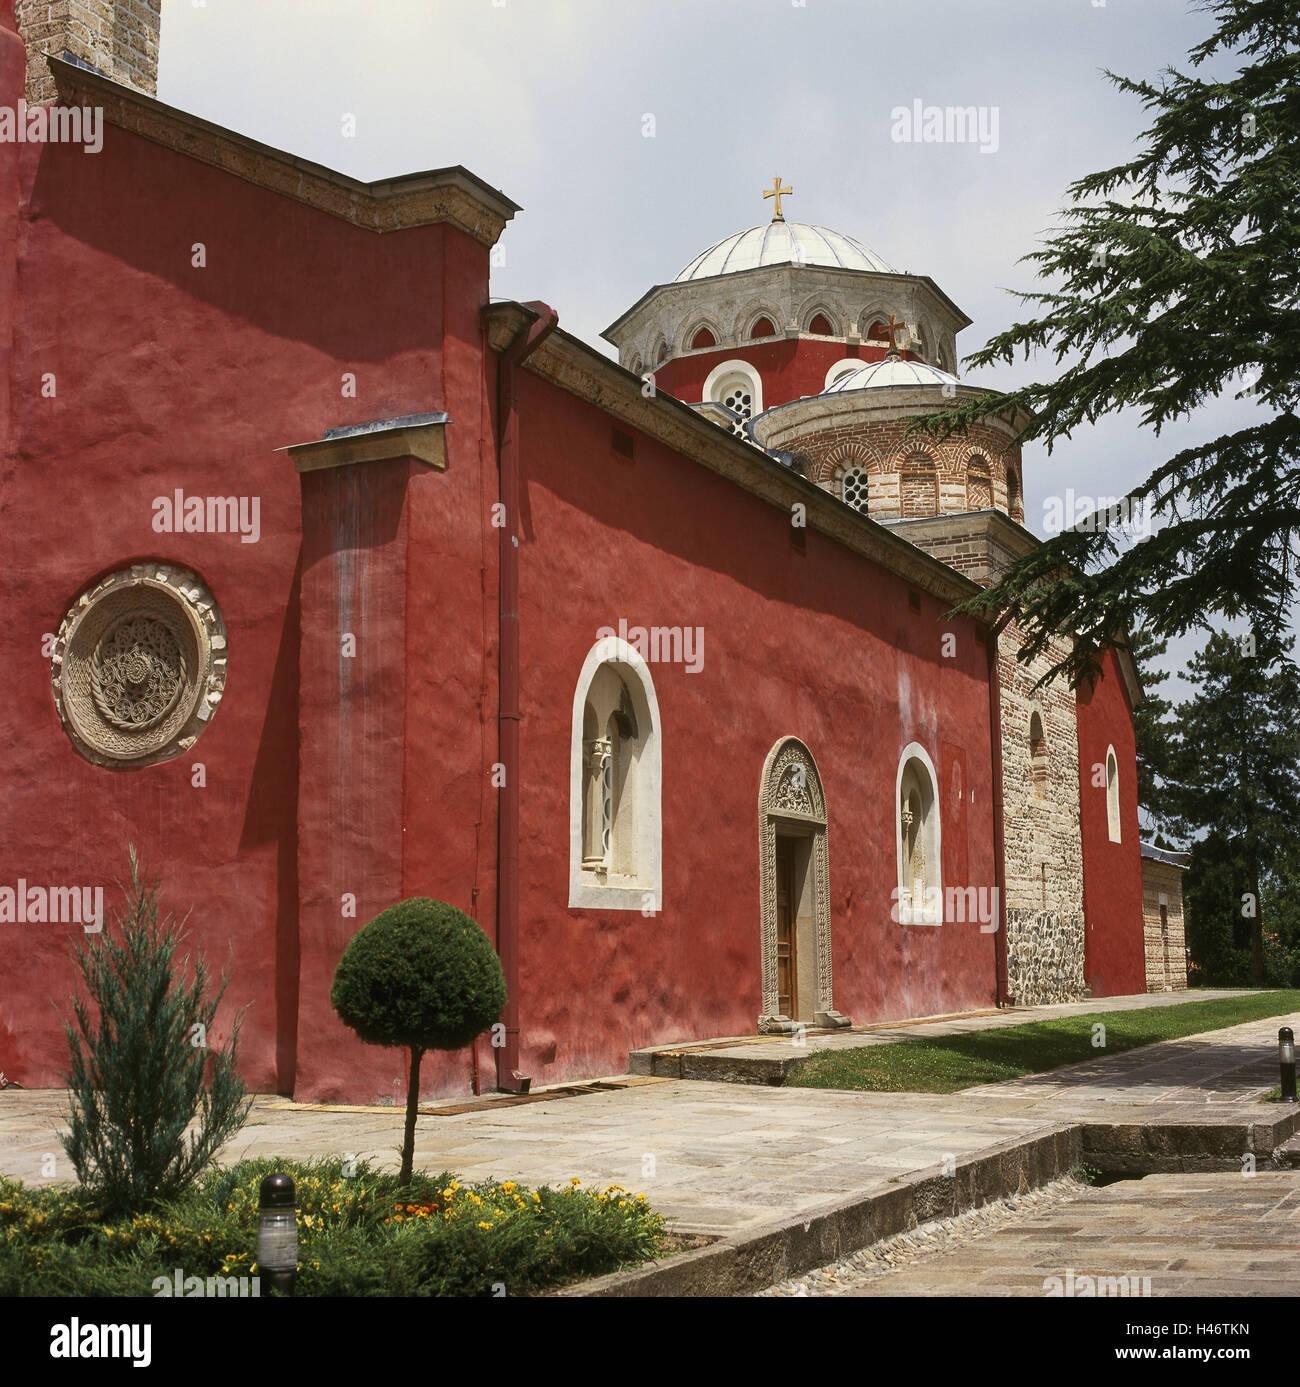 Serbia, Kraljevo, cloister Zica, detail, place of interest, faith, religion, Christianity, building, structure, architecture, cloister building, architectural style, Serbian-orthodox, outside, deserted, Stock Photo